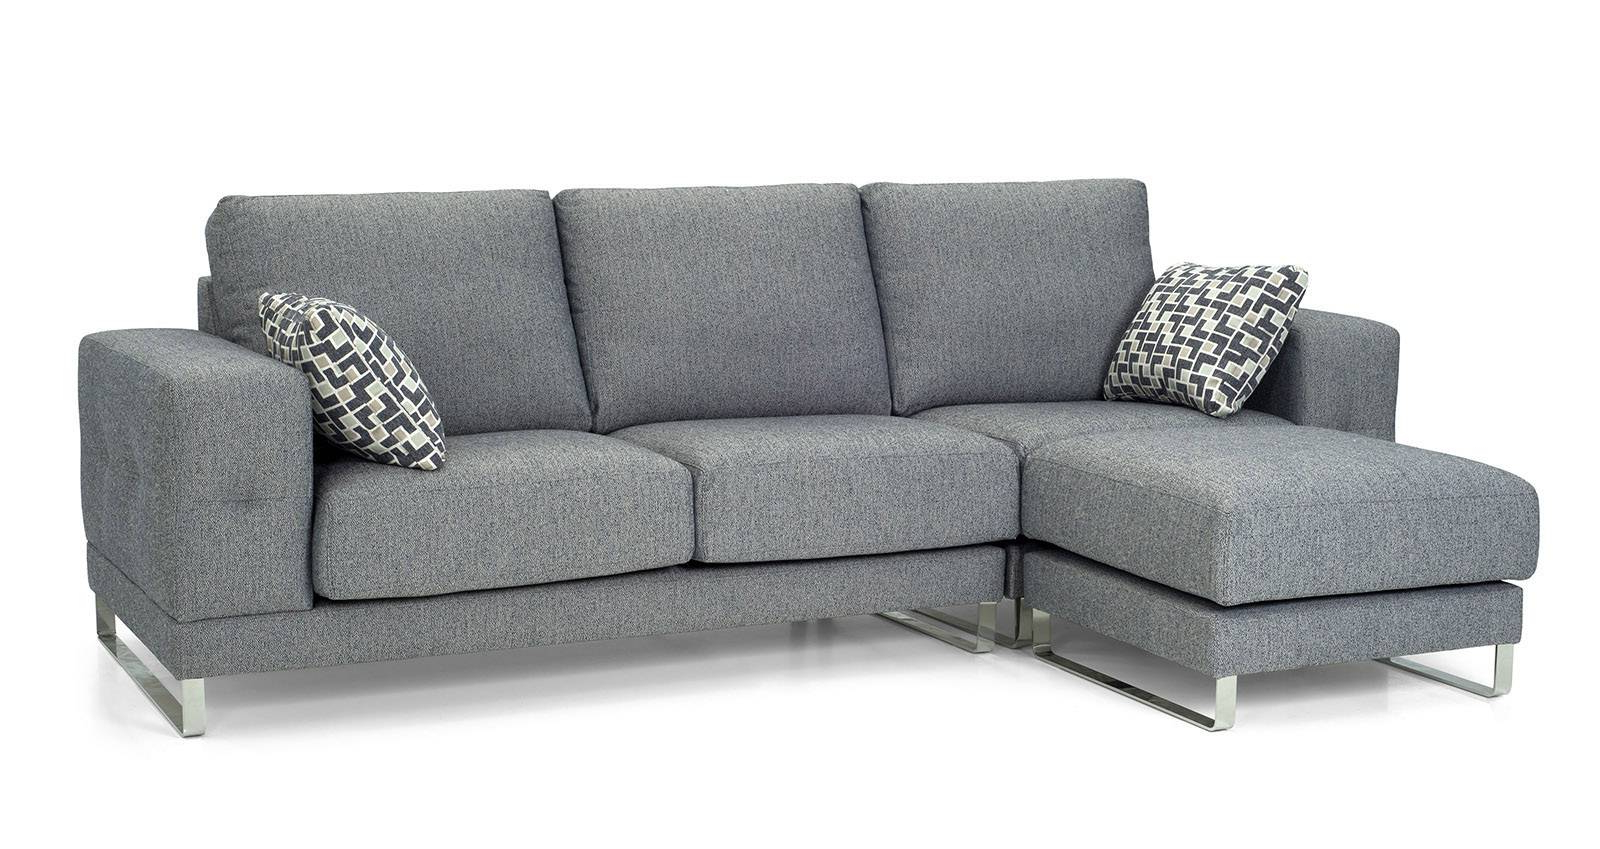 Stock sofas Carretera toledo Fmdf sofà Chaise Longue Modelo Chic Izquierdo